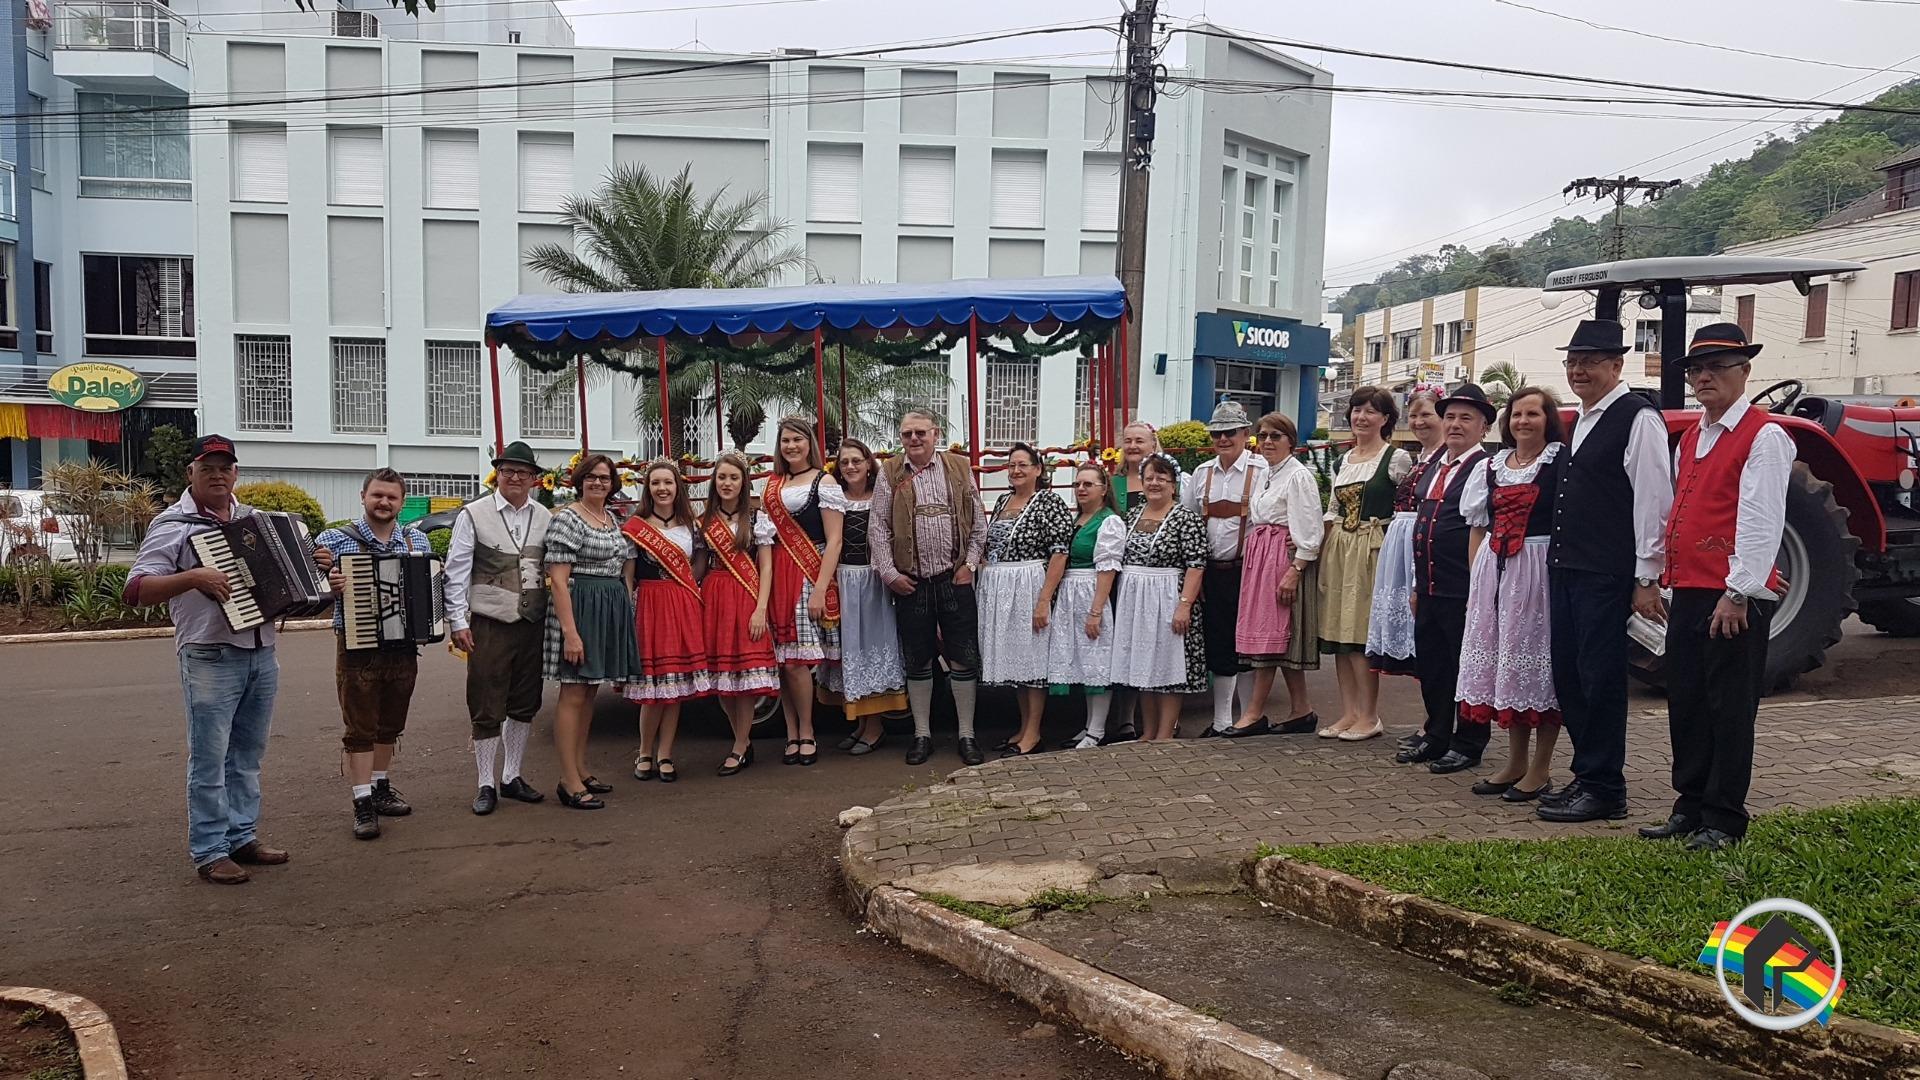 Vídeo - Itapiranga entra em clima de Oktoberfest